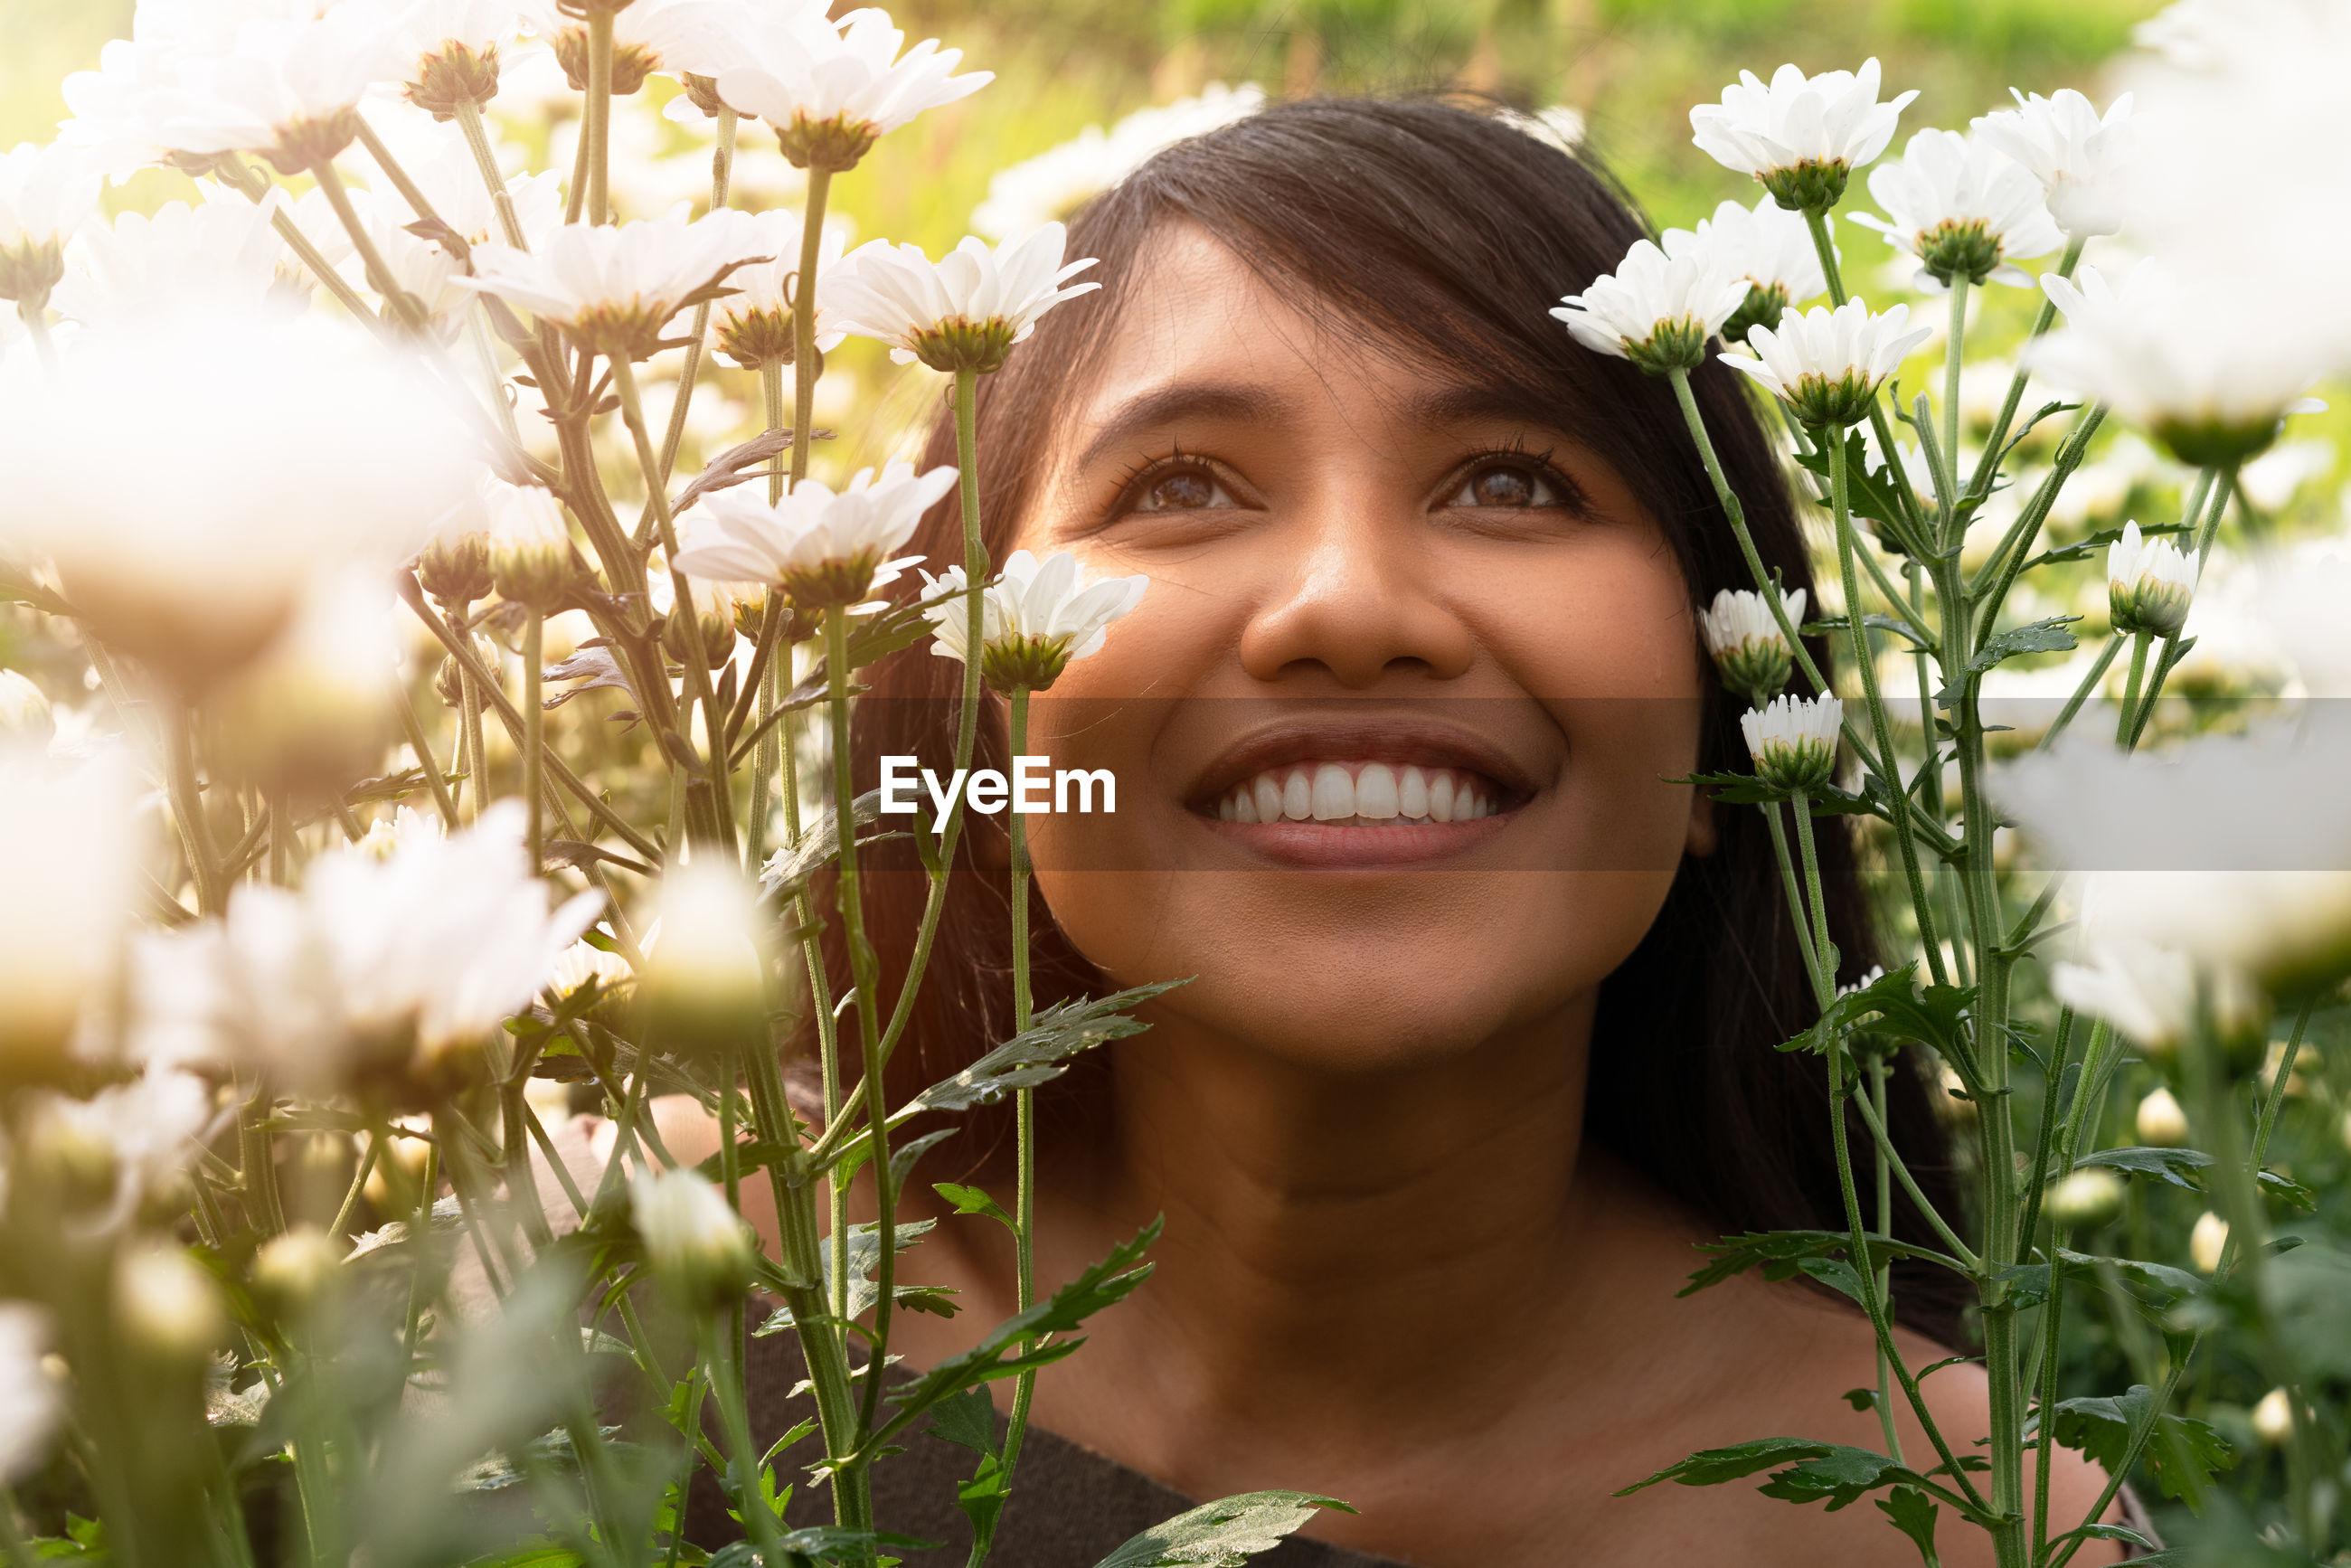 Smiling woman against blooming flowers